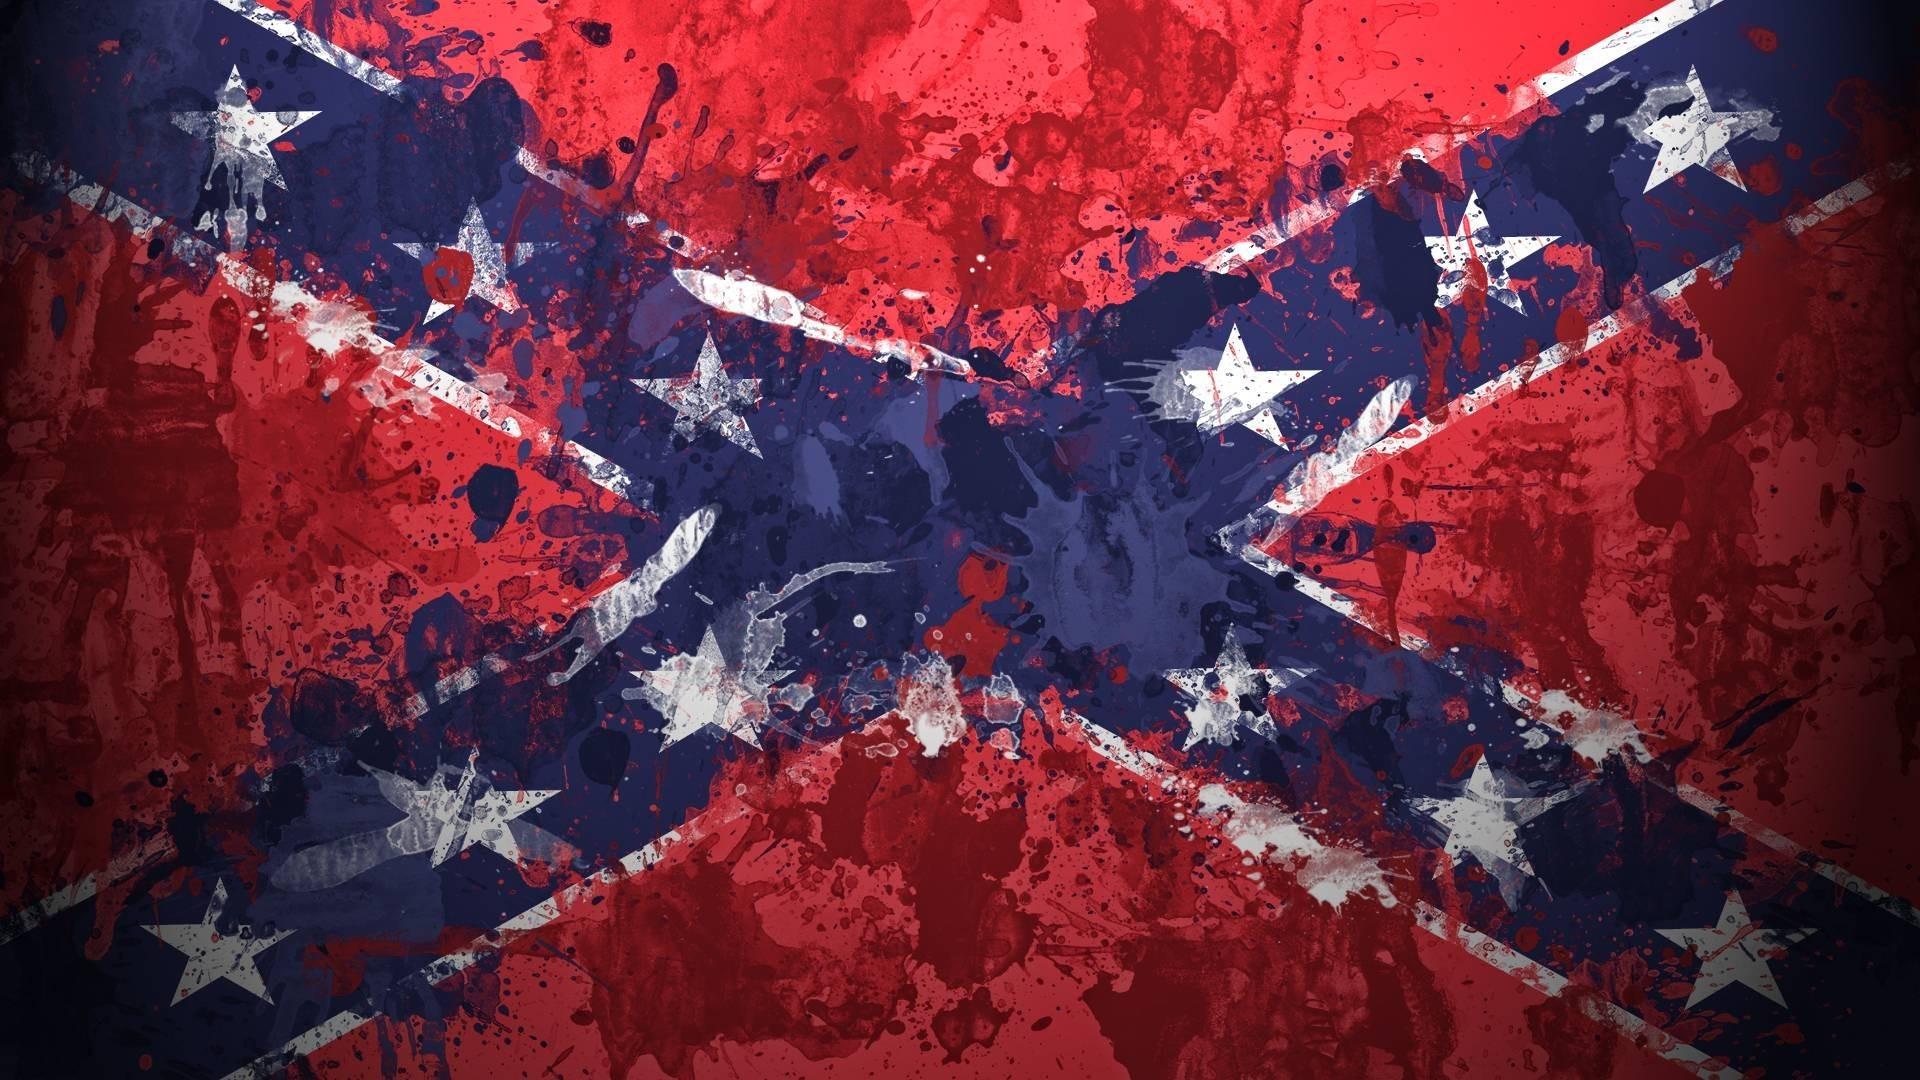 1920x1080 1920x1080 amazing confederate flag wallpaper 1920x1080 full hd